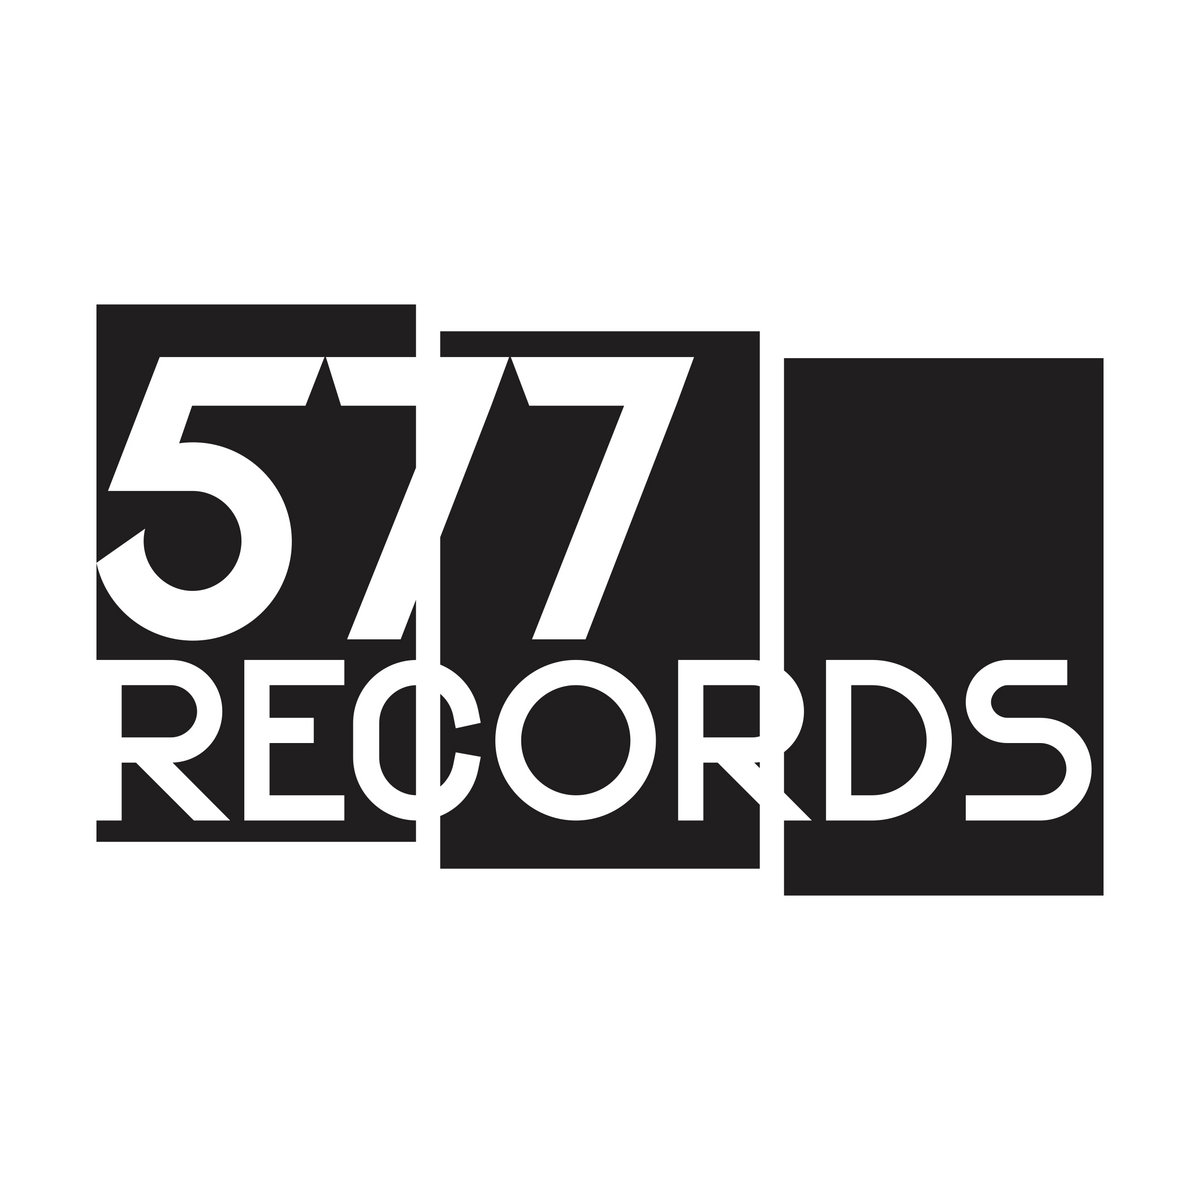 577 Records image